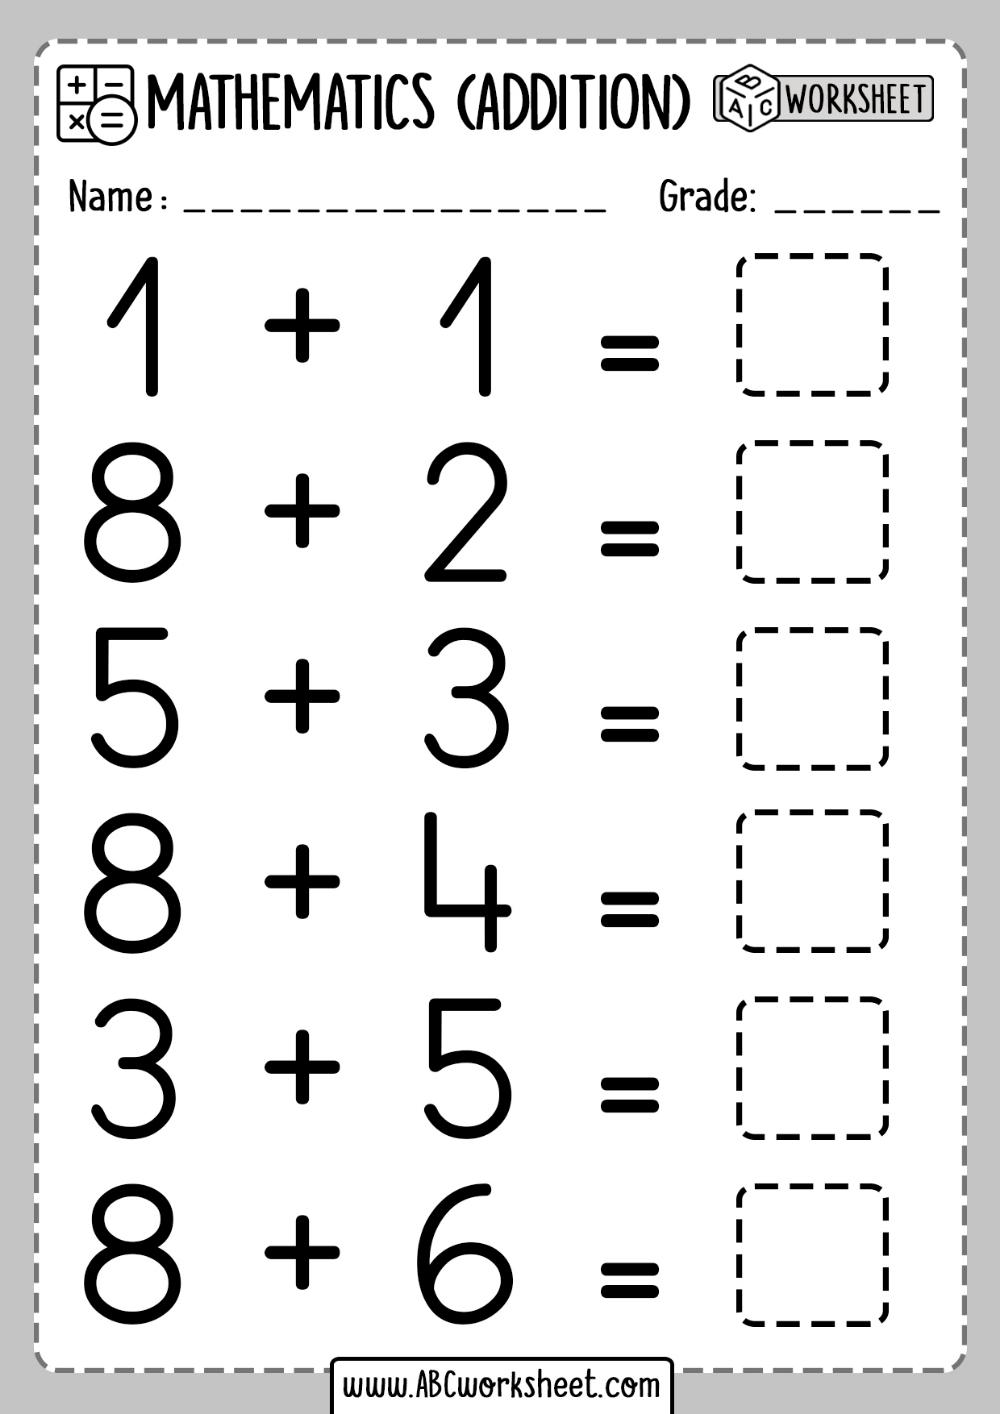 small resolution of 1st Grade Math Worksheet Addition - ABC Worksheet en 2020